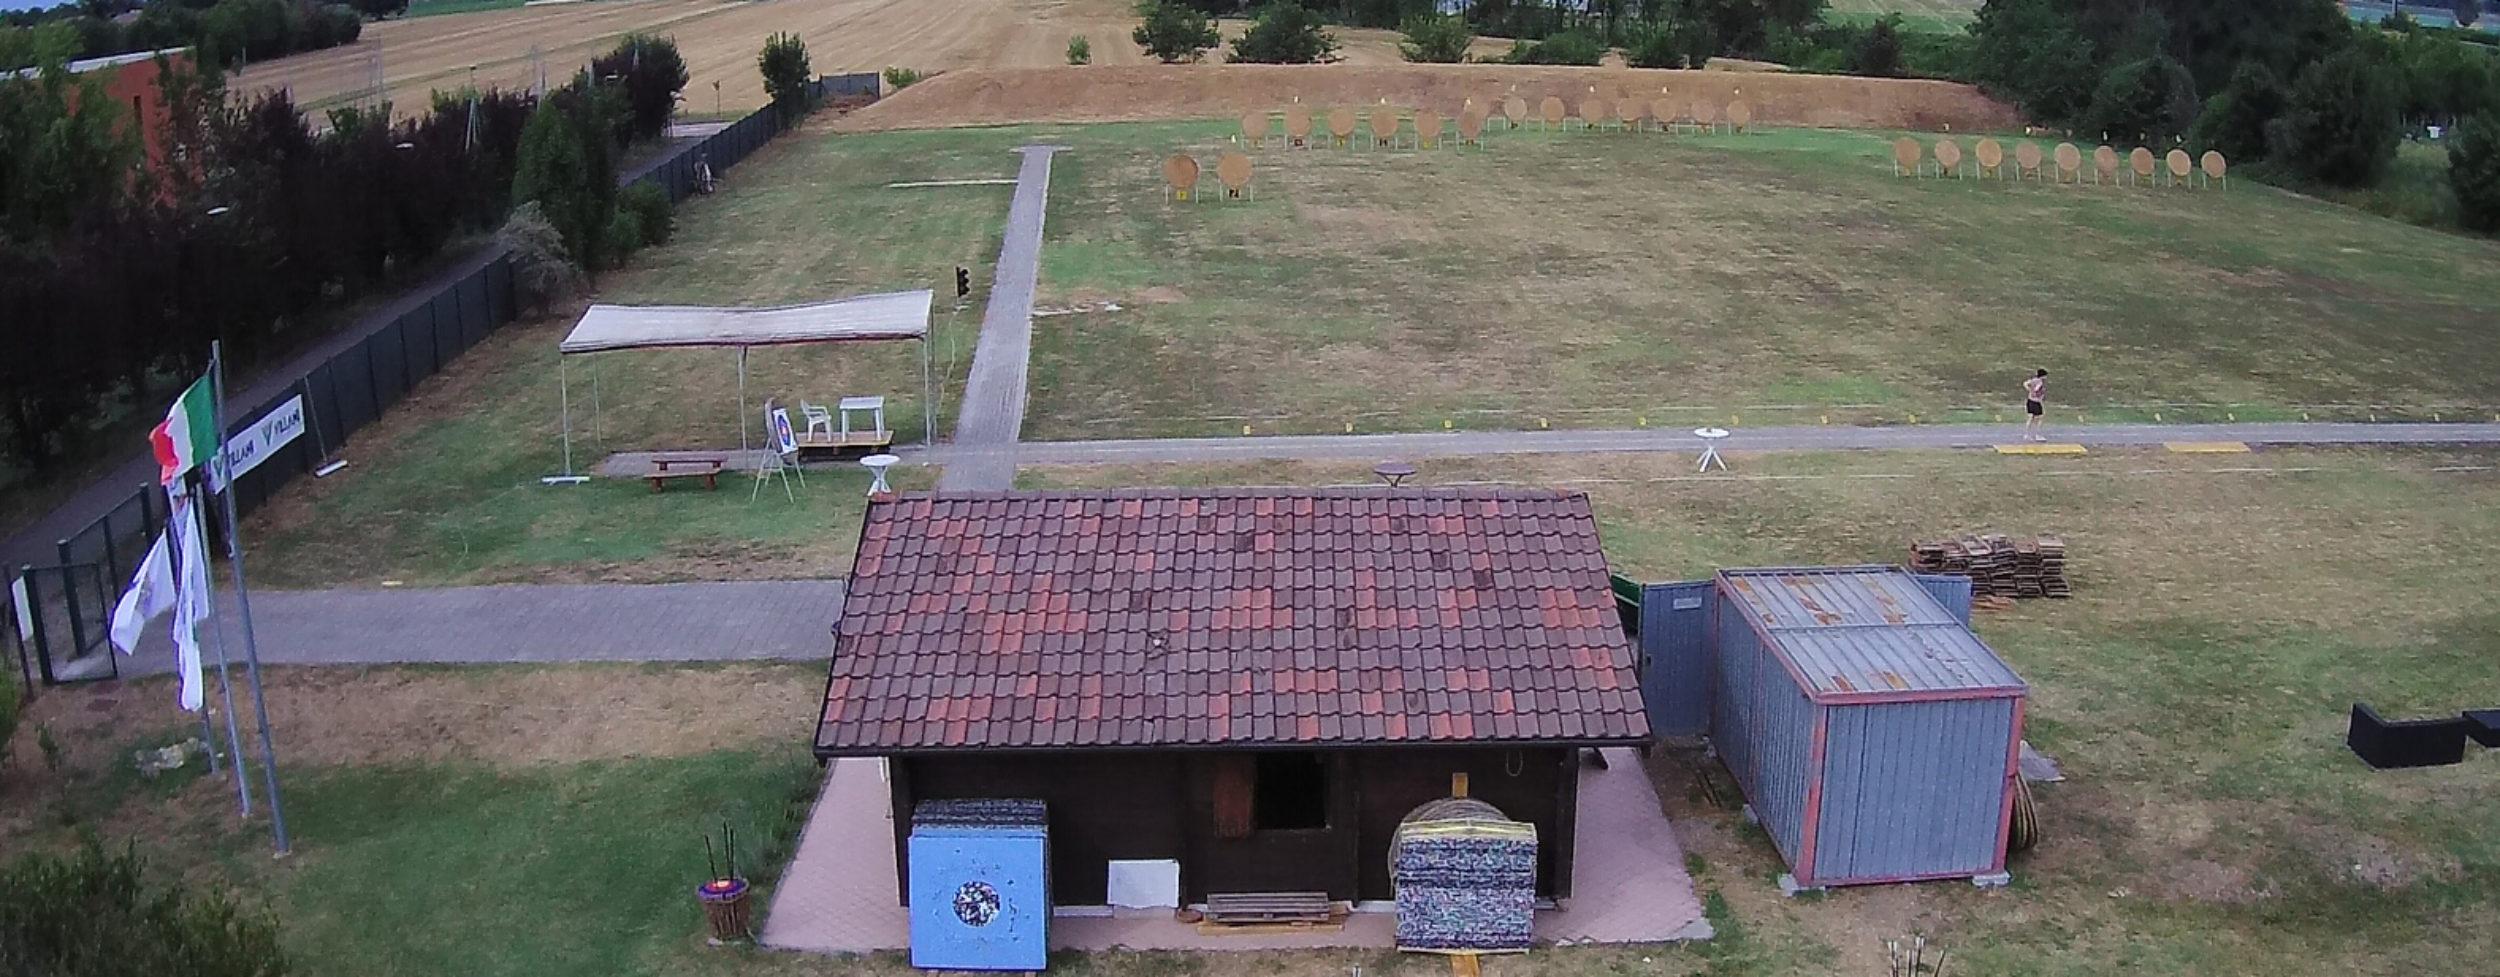 A.s.d Arcieri Montale